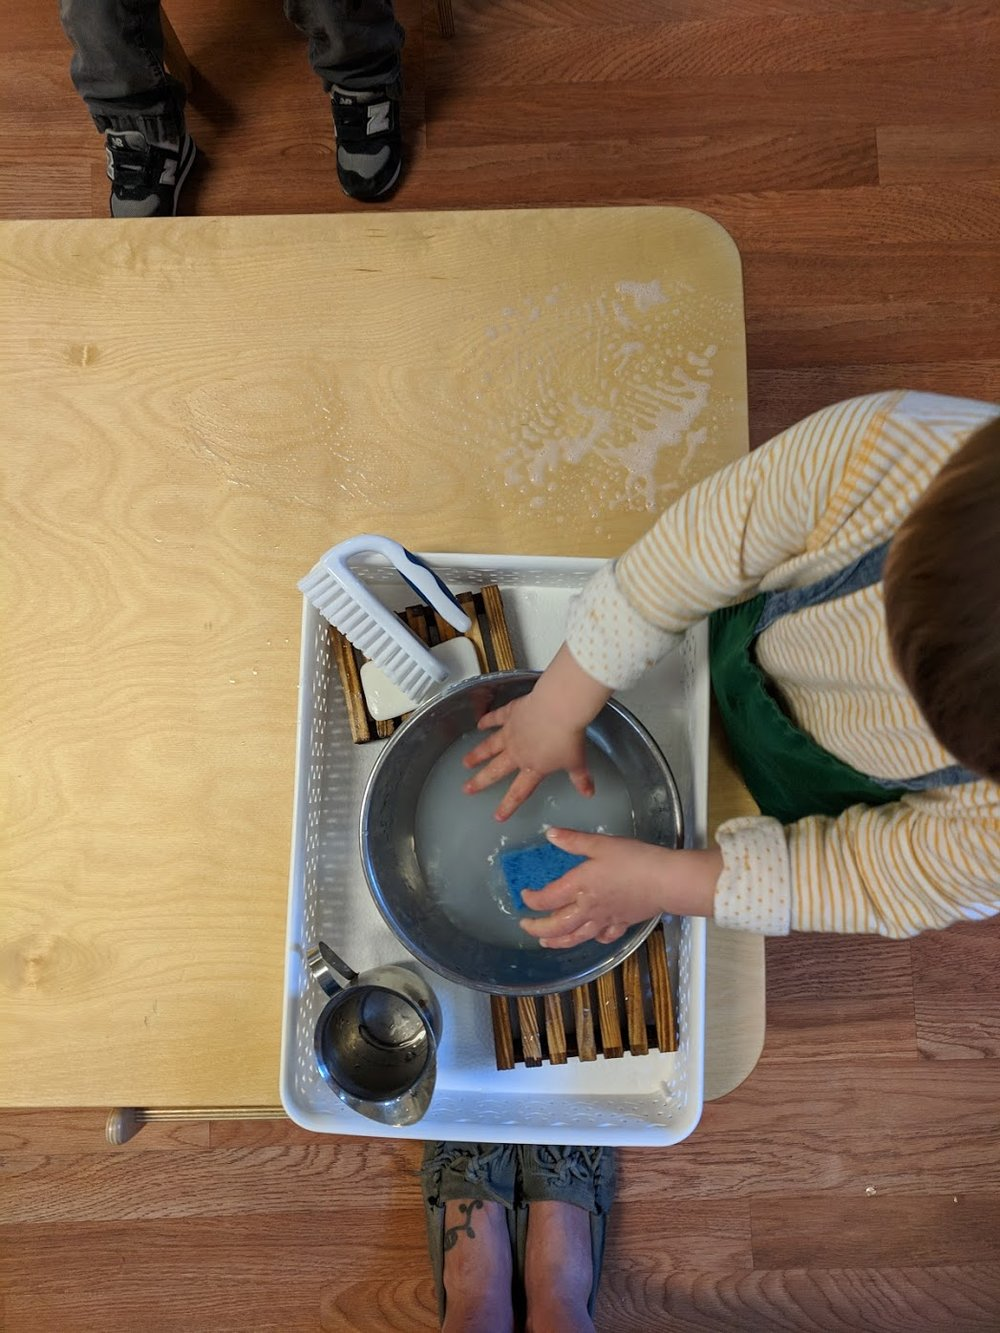 Table Scrubbing 2.5 years